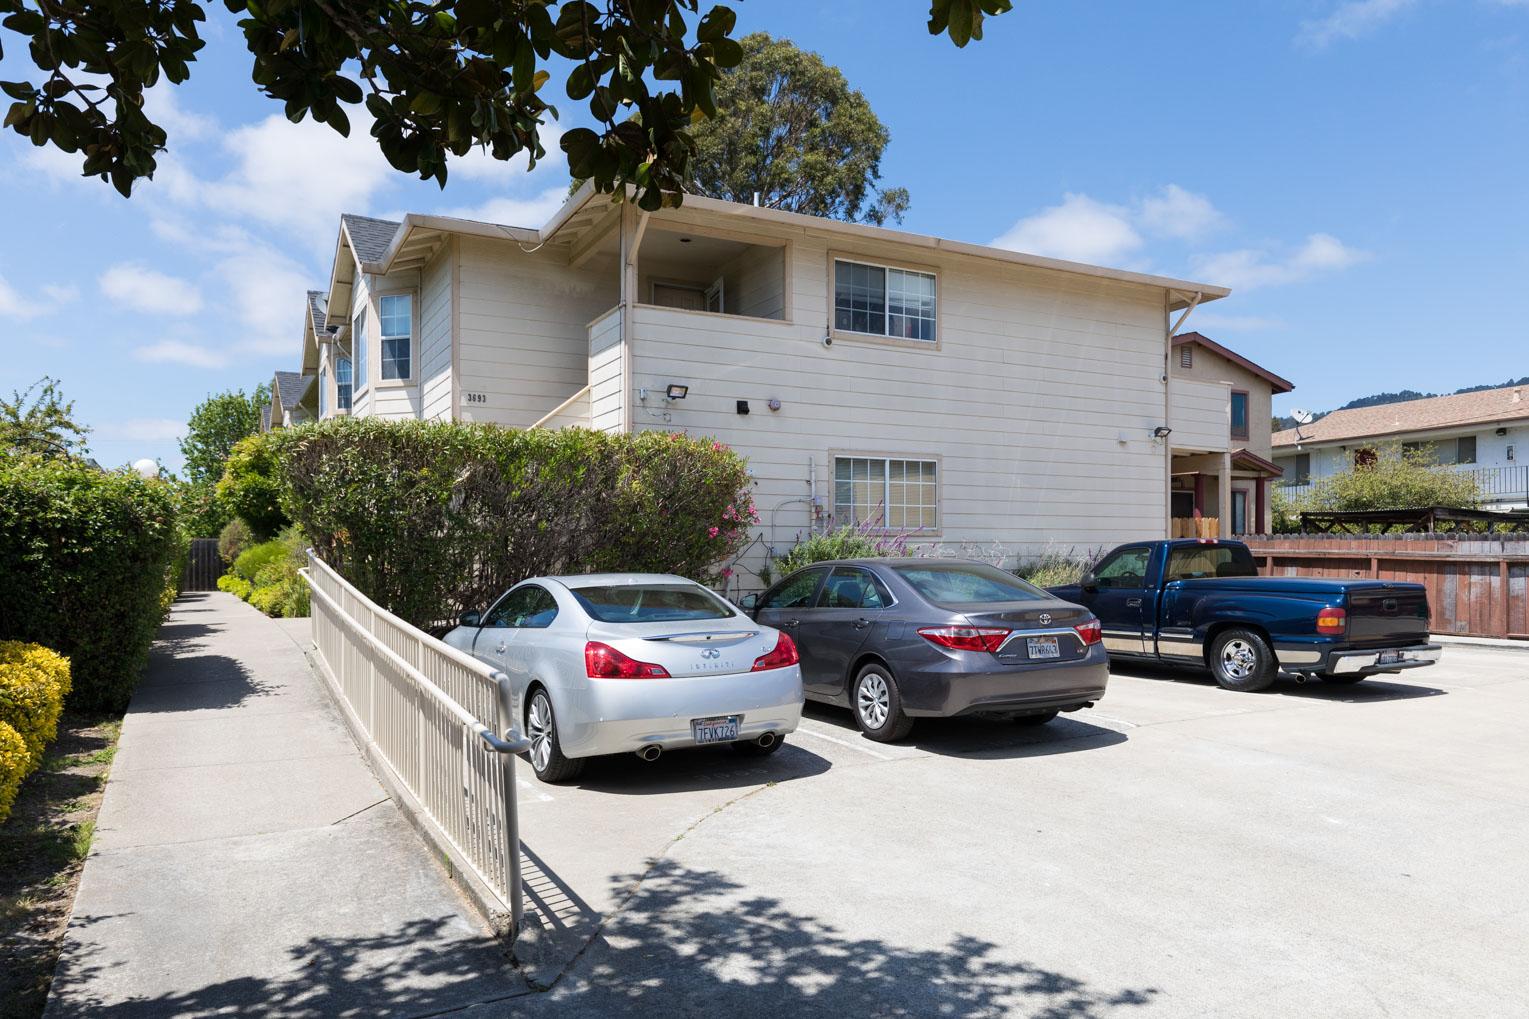 3691 Maybelle Ave, Oakland